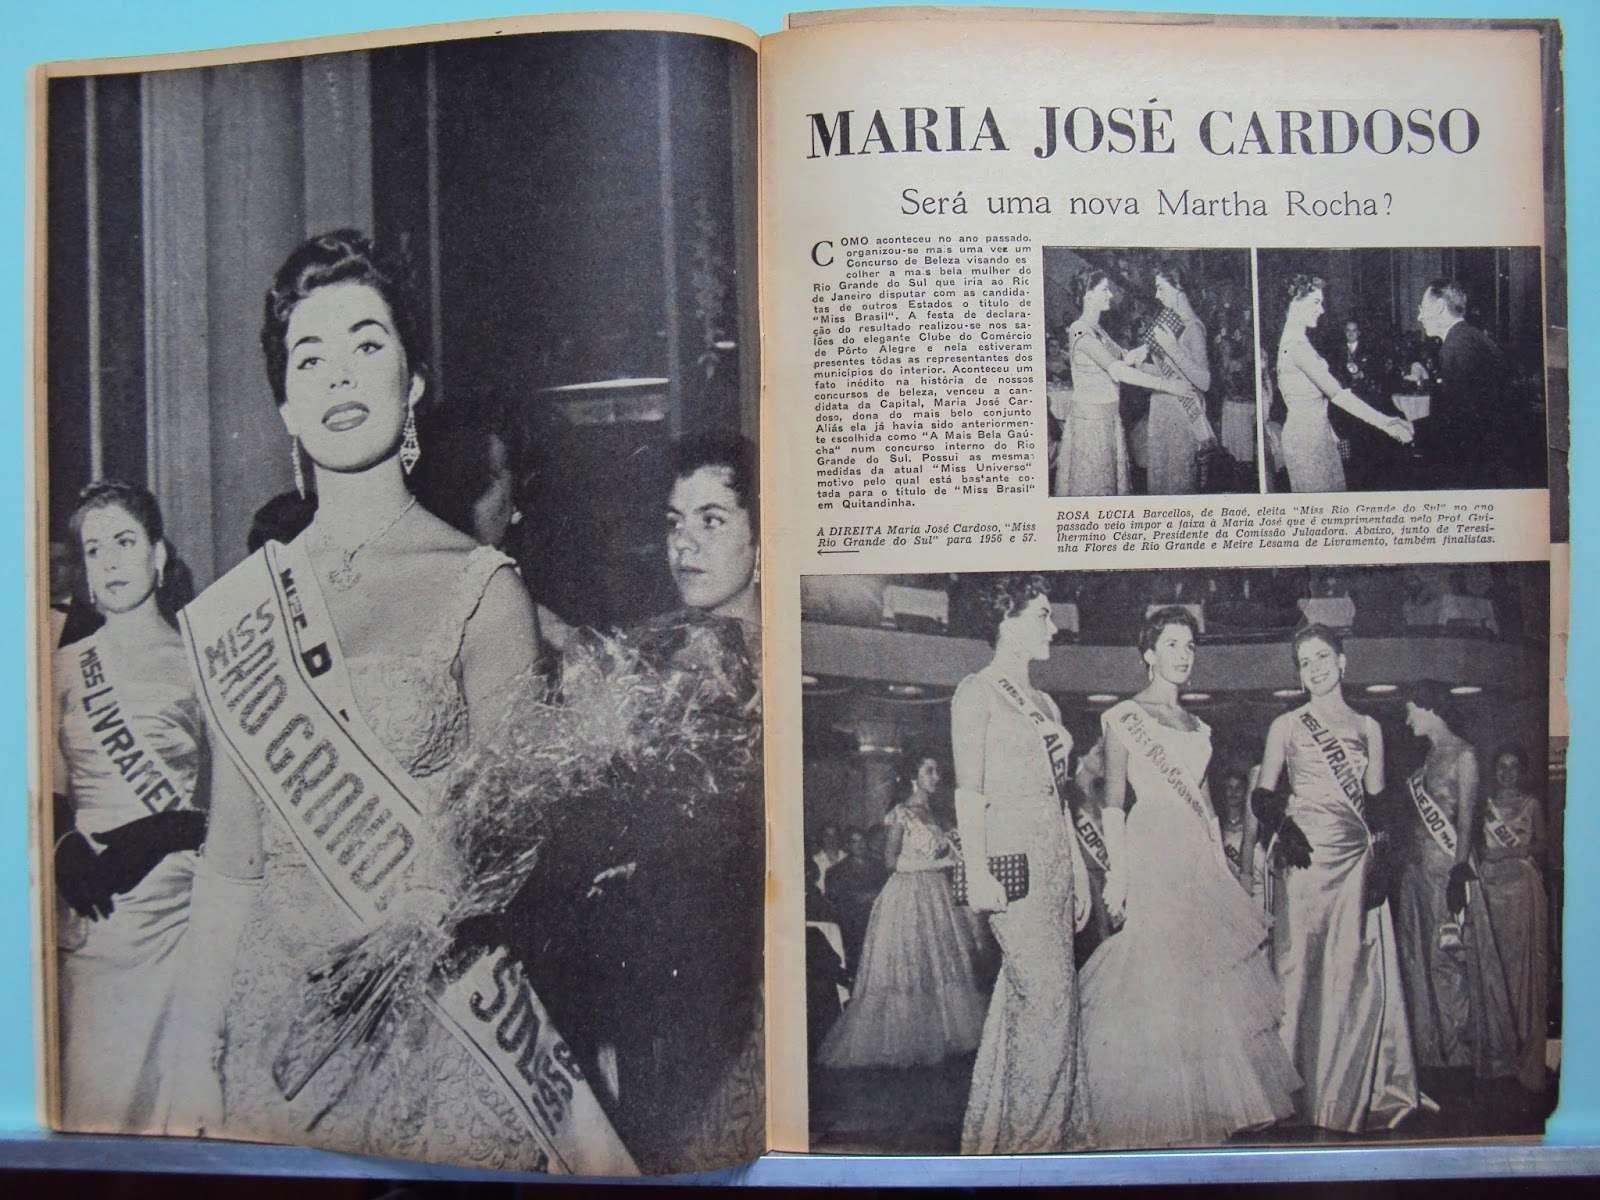 maria jose cardoso, semifinalista de miss universe 1956. 33155610